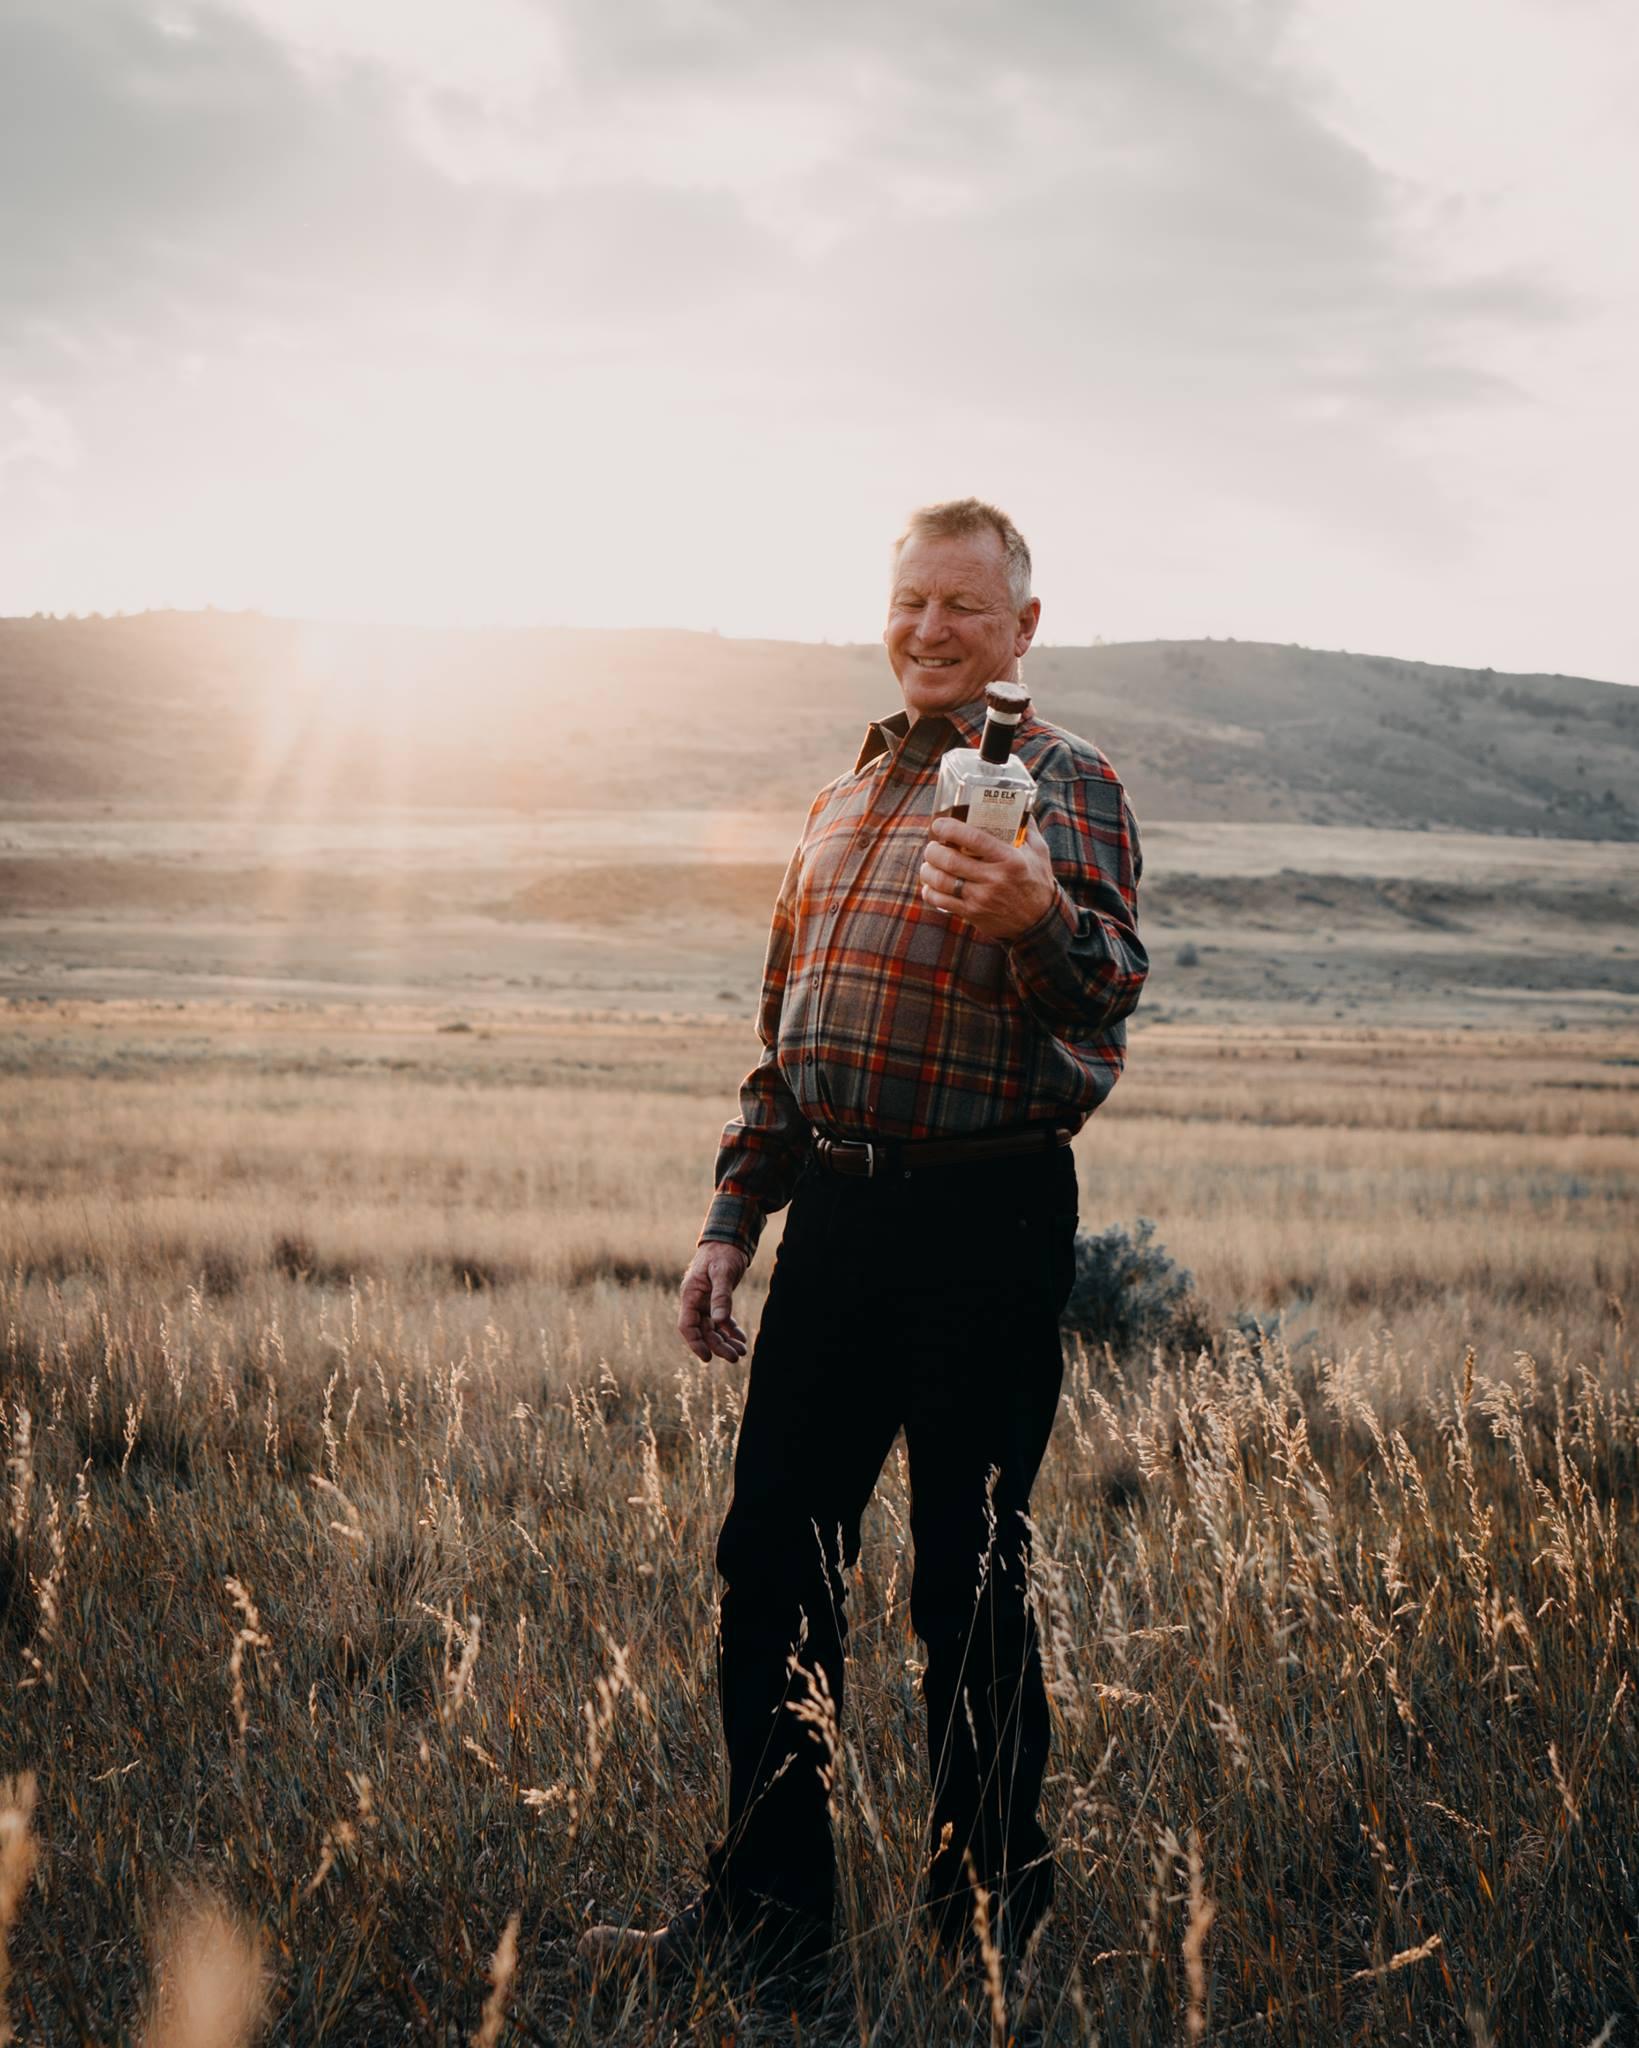 Legendary Master Distiller Greg Metze created the Old Elk recipe and process.